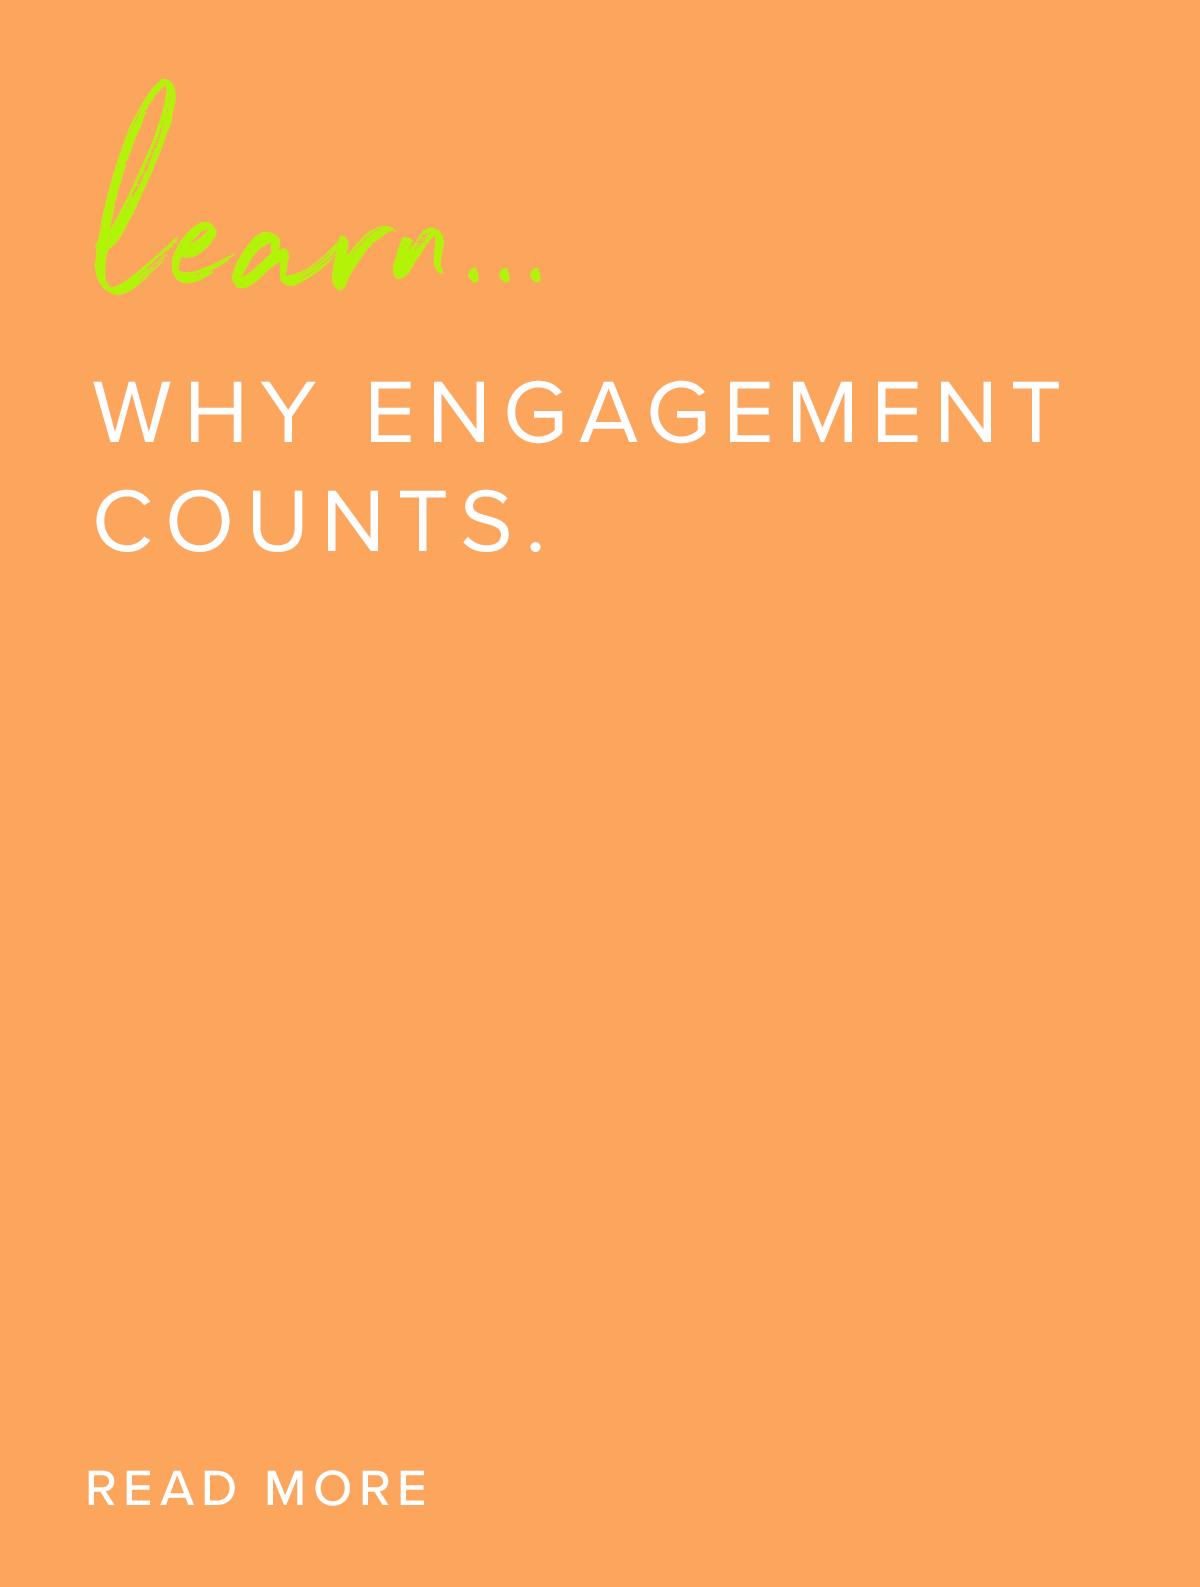 engagement counts